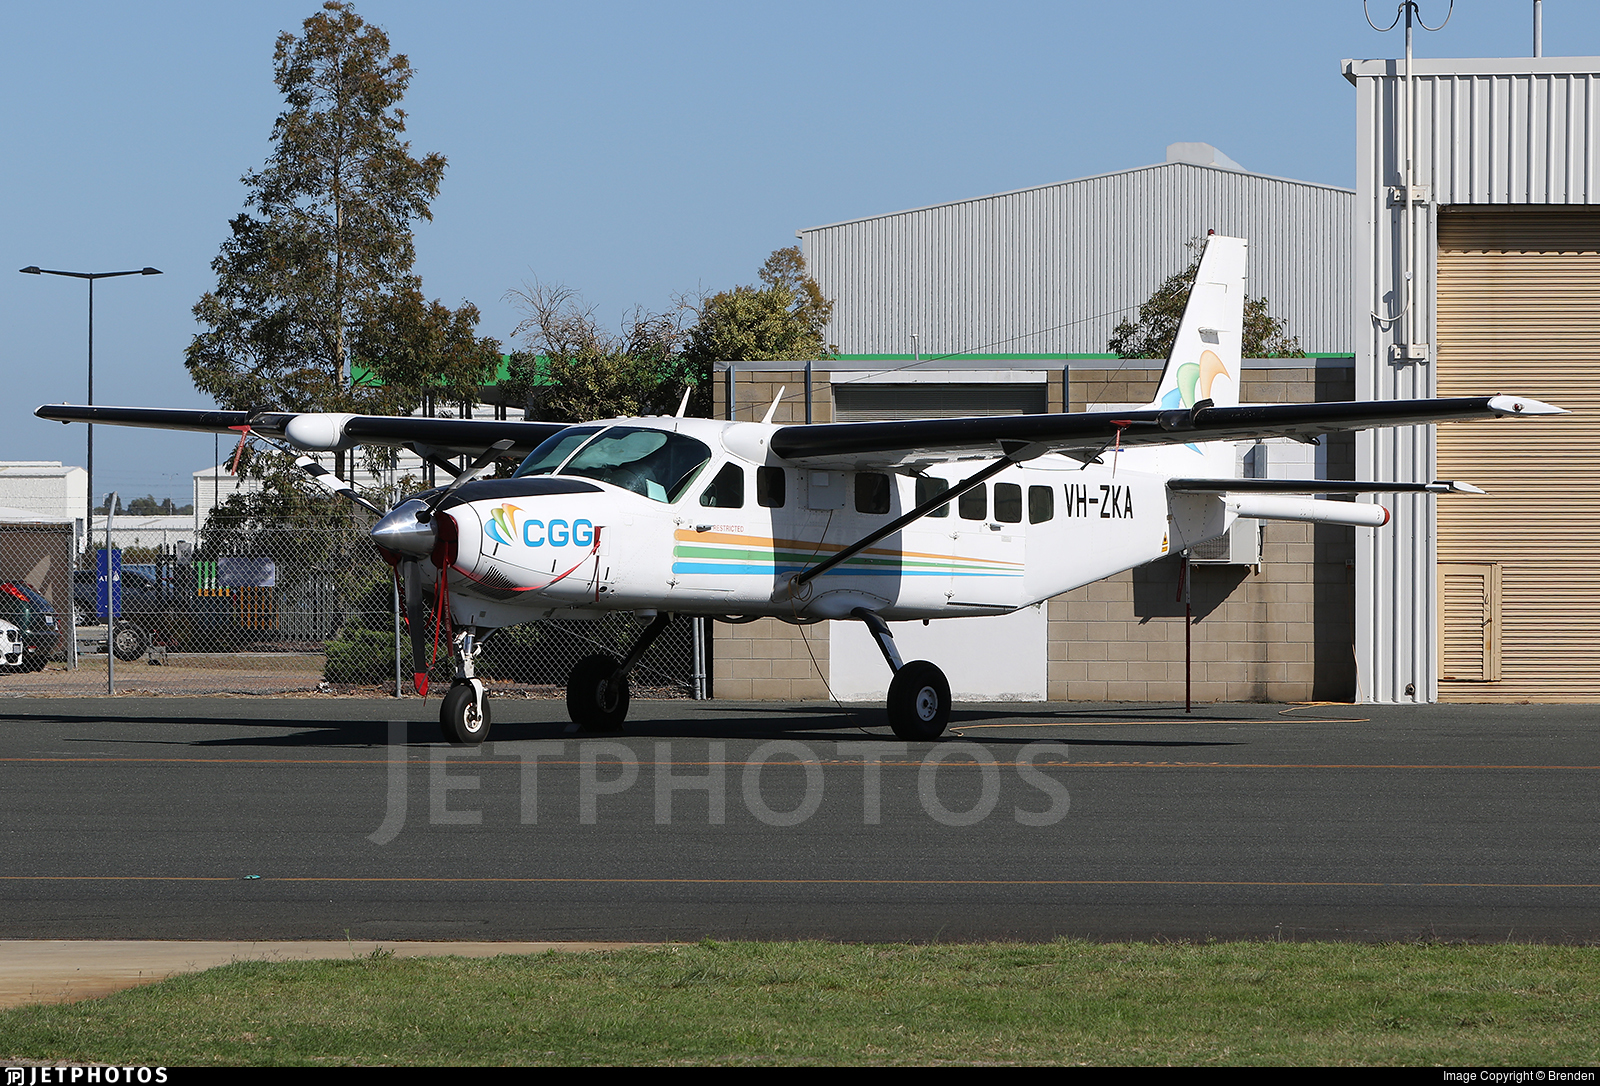 VH-ZKA - Cessna 208B Grand Caravan - CGG Aviation